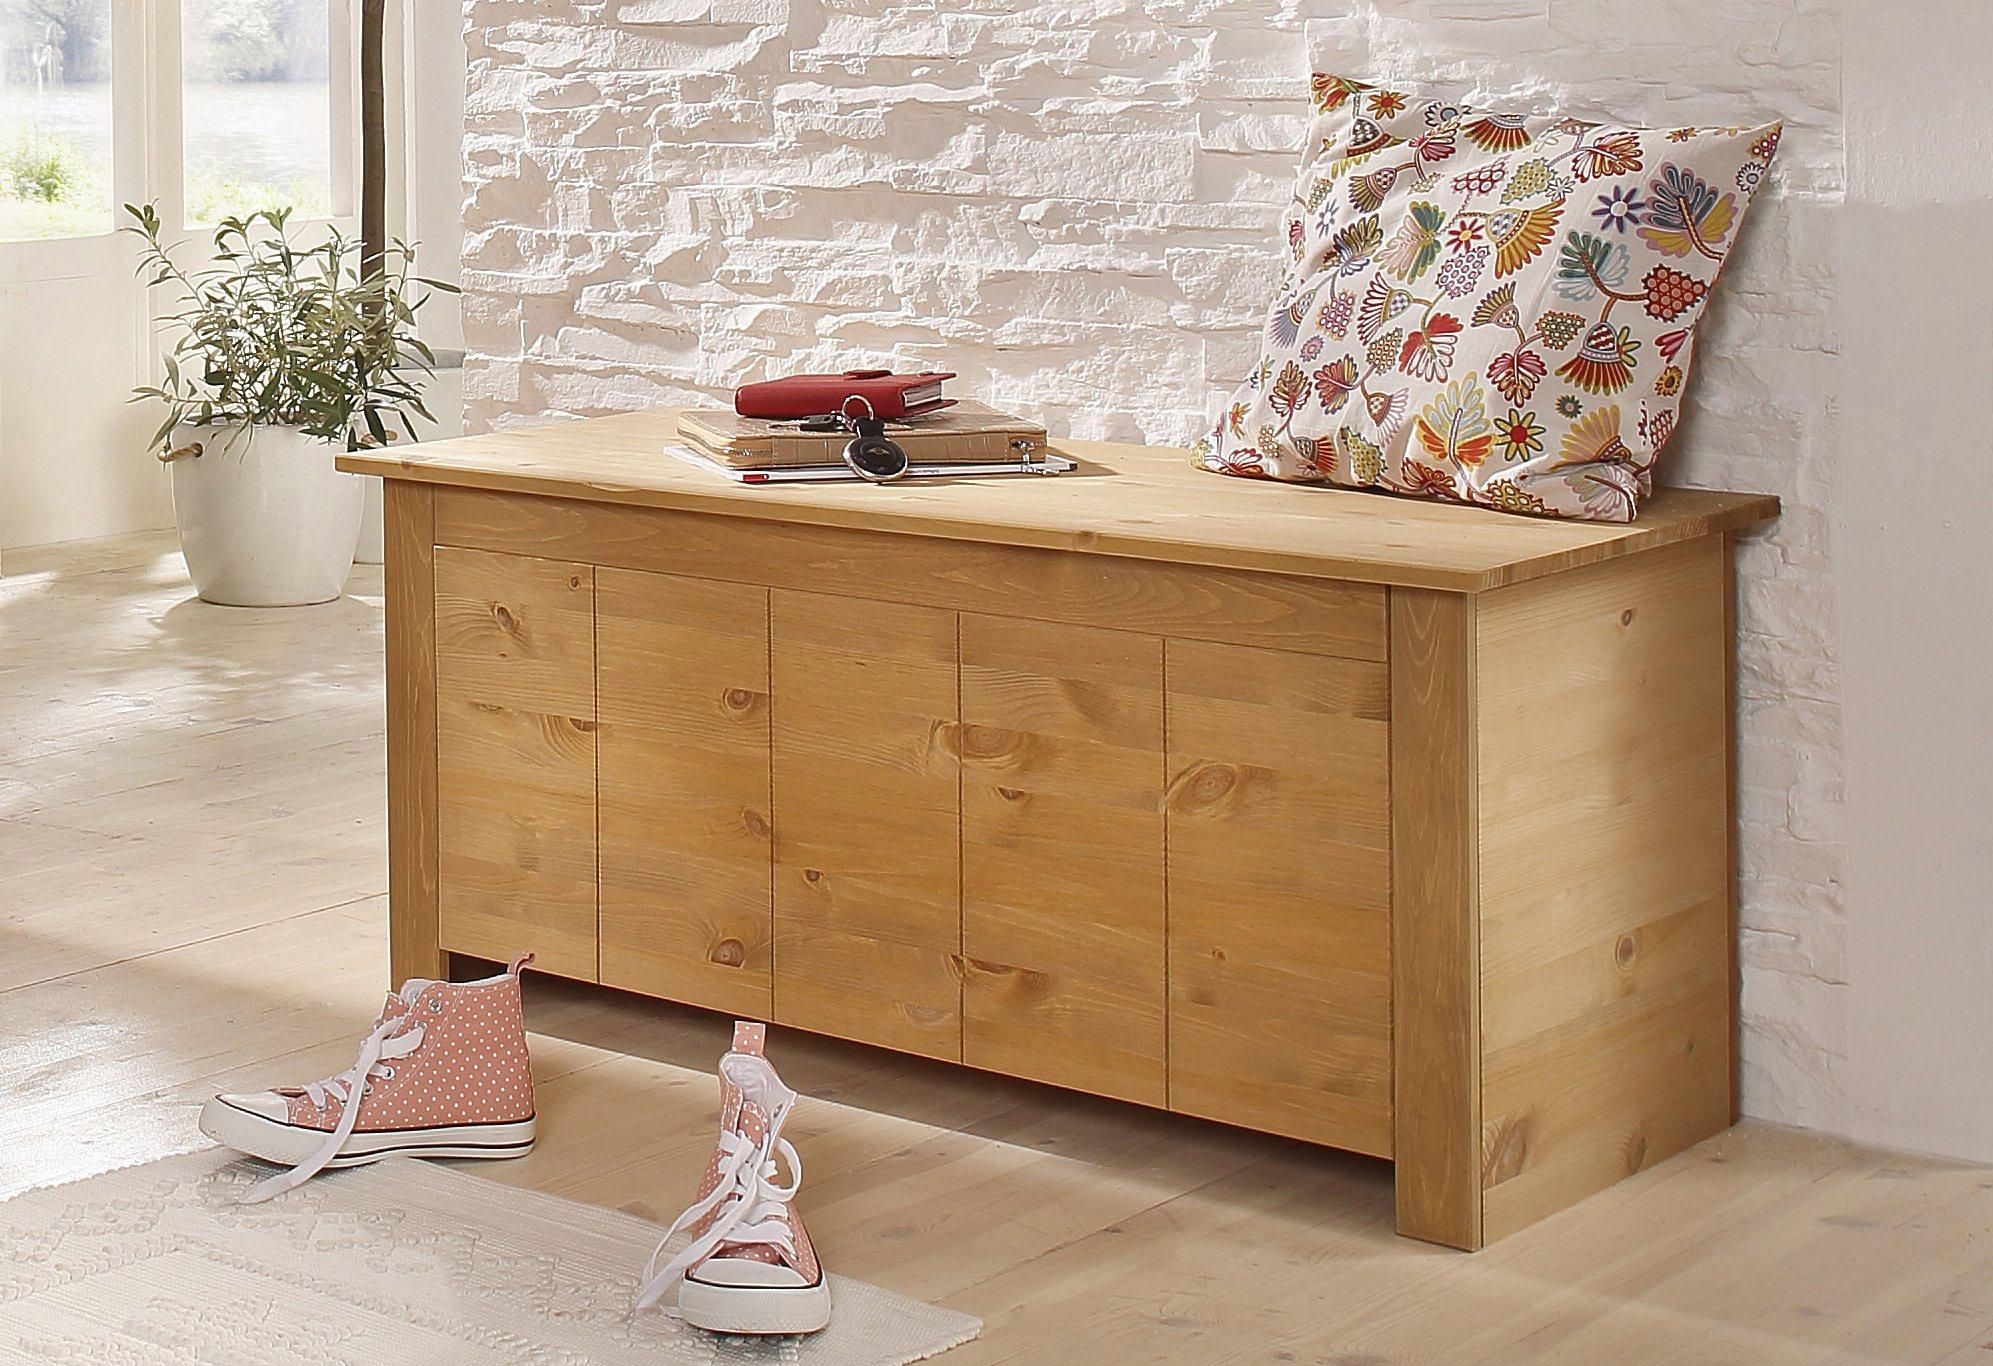 Sitztruhe, Home affaire, »Bertram« | Küche und Esszimmer > Sitzbänke > Sitztruhen | Poliert - Holz | Home affaire